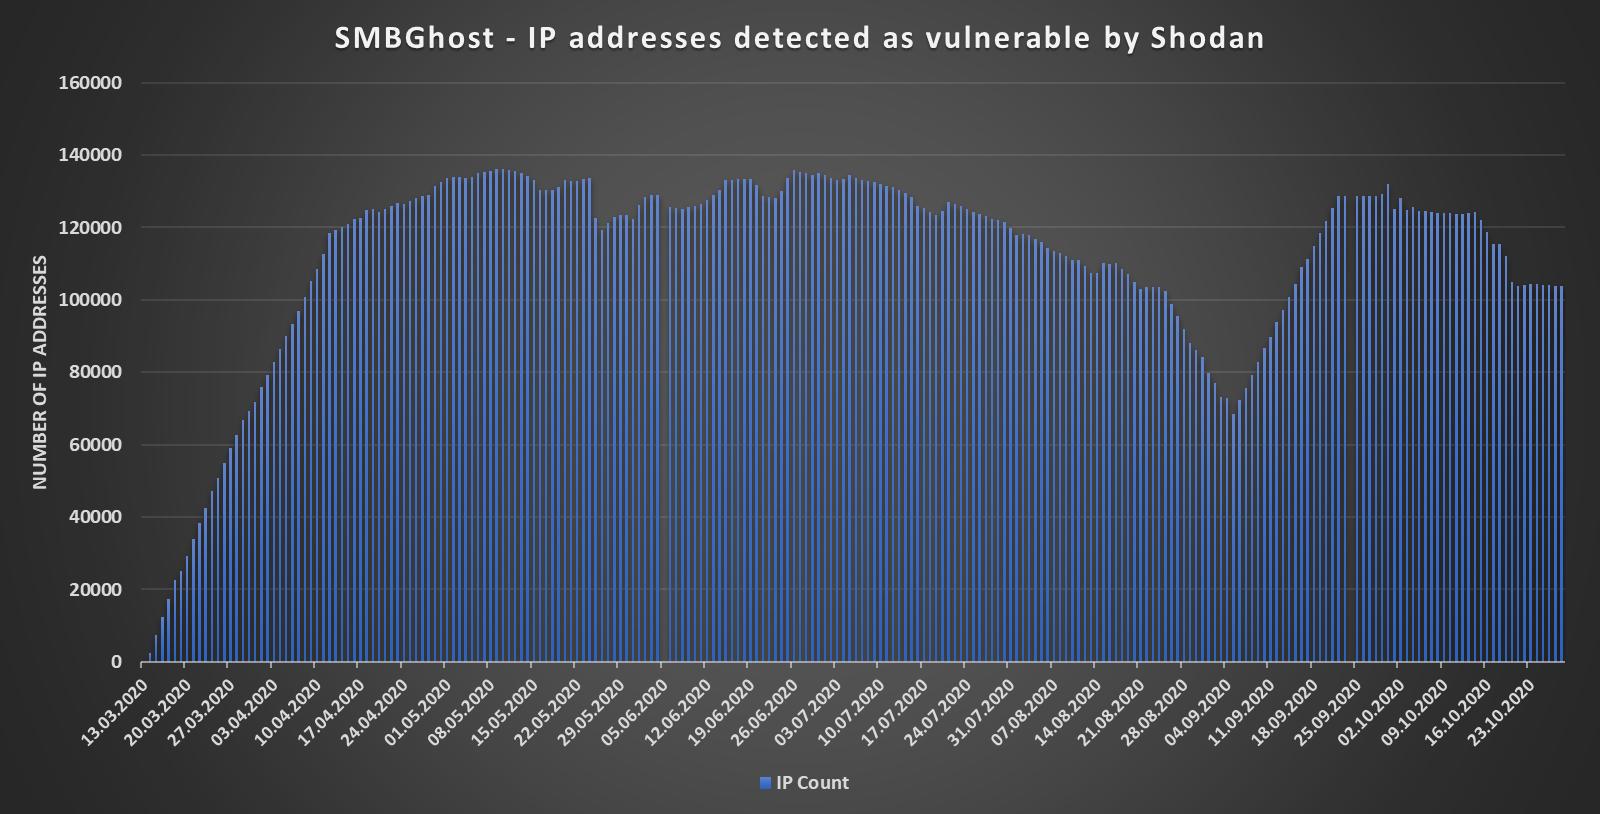 SMBGhost Shodan detections